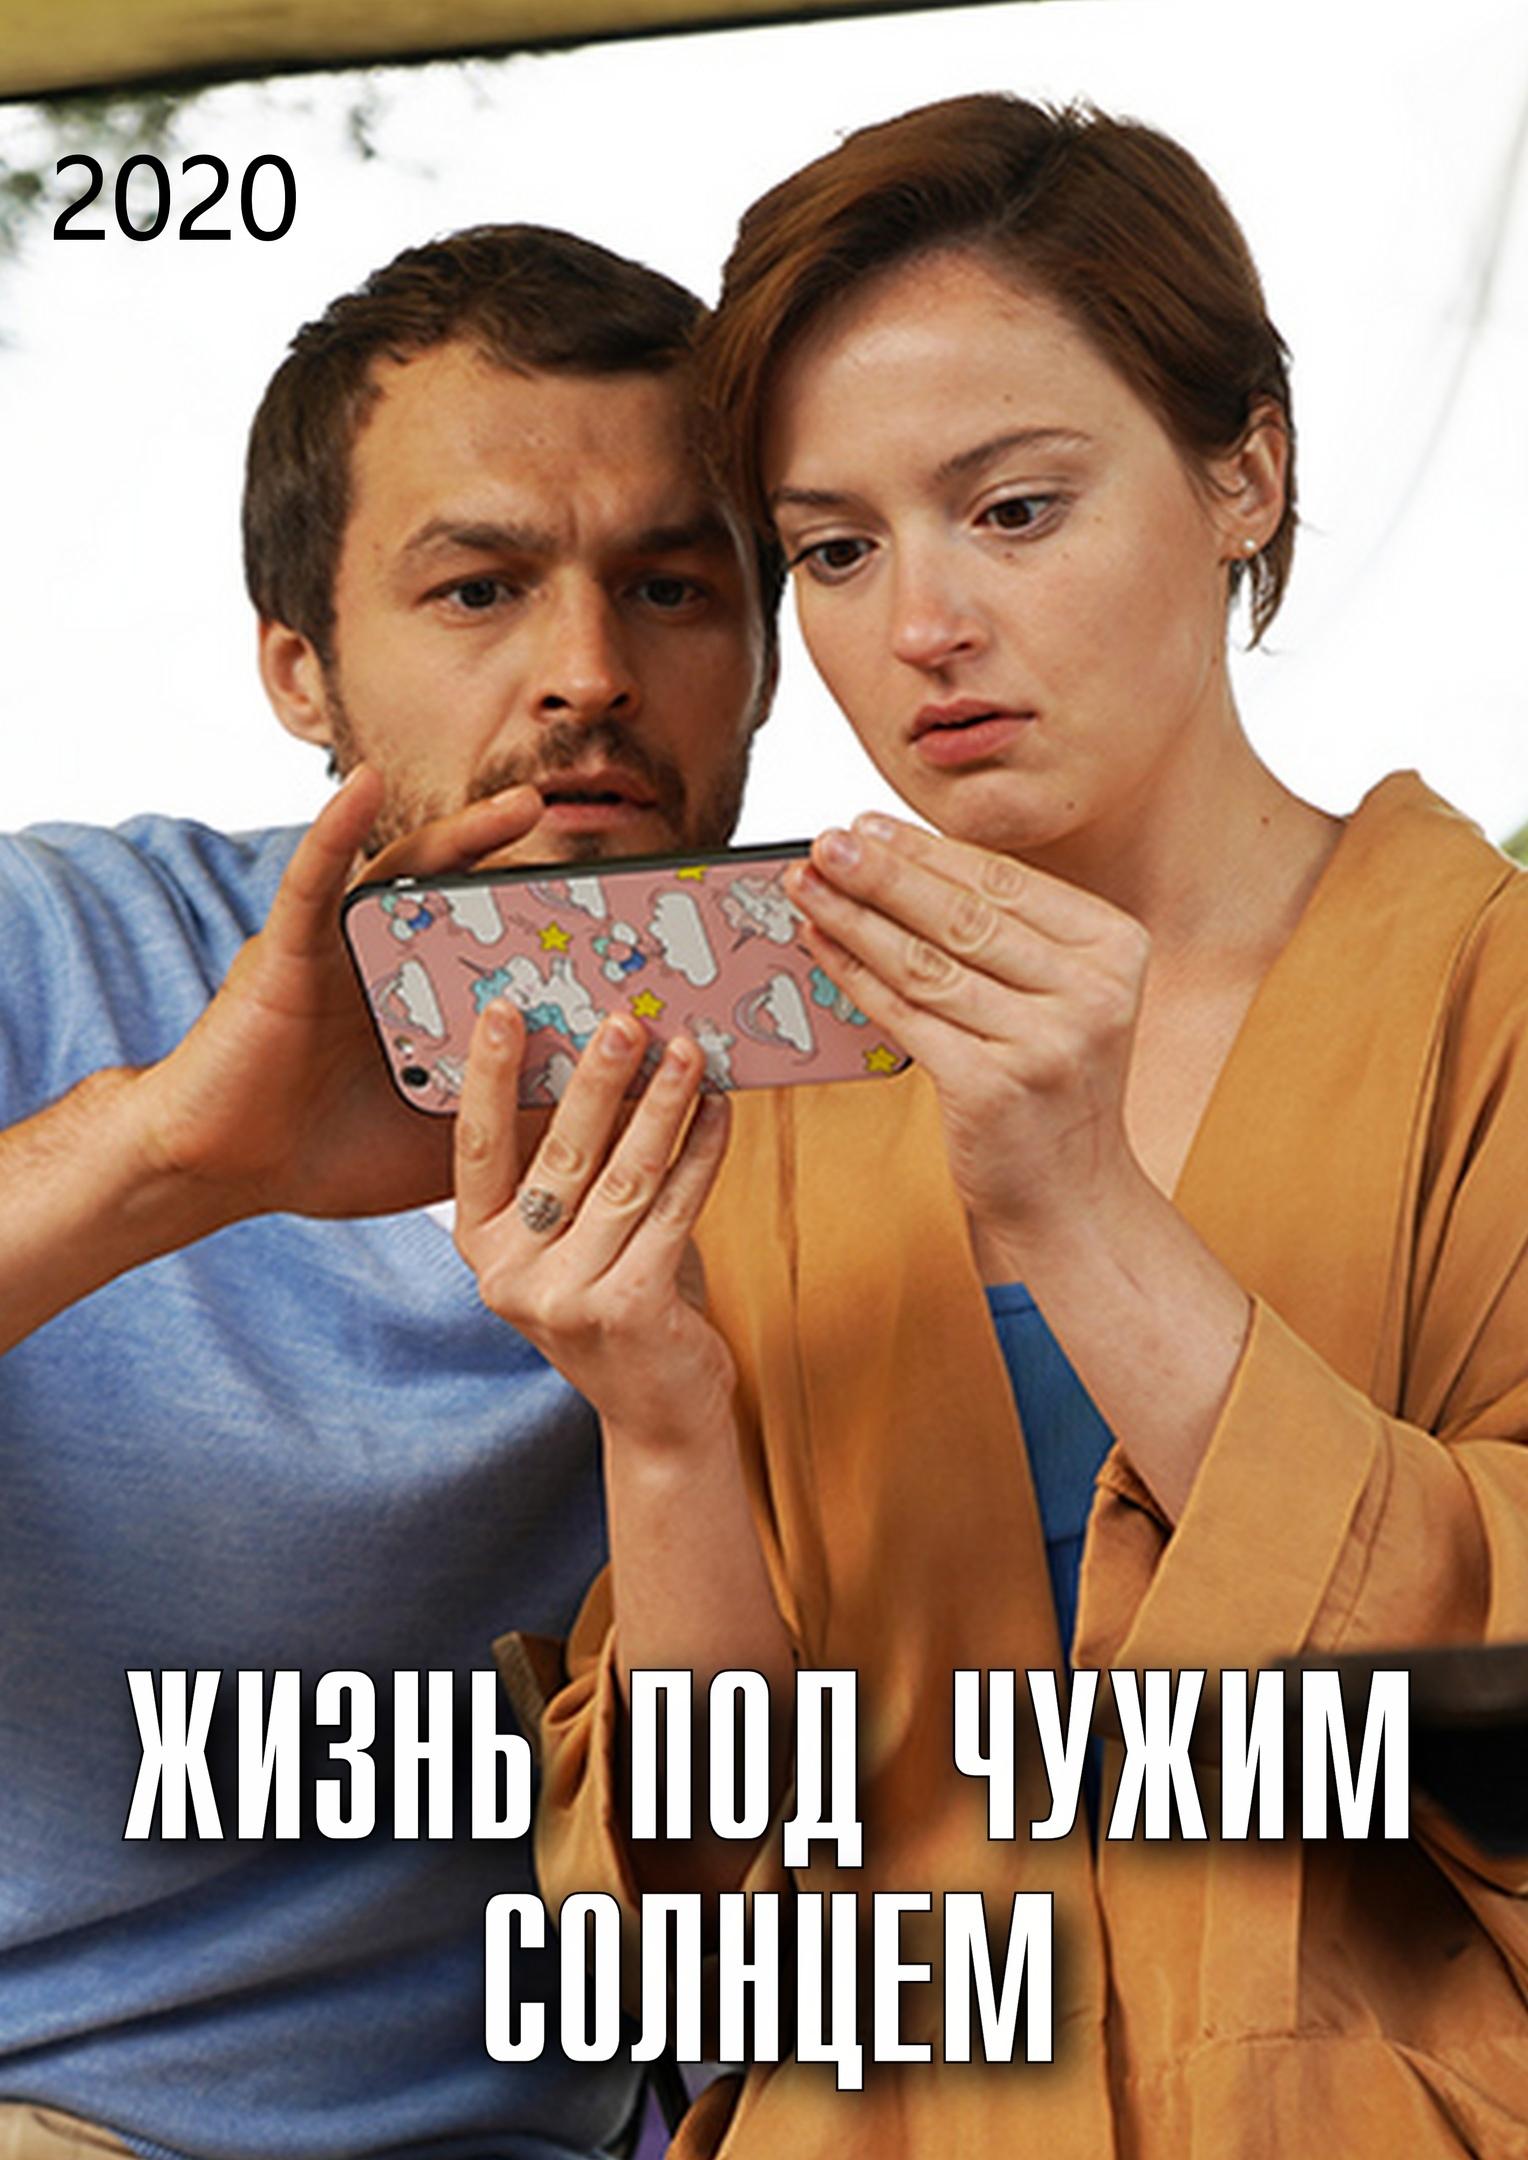 Детектив «Жизнь пoд чyжим coлнцeм» (2020) HD